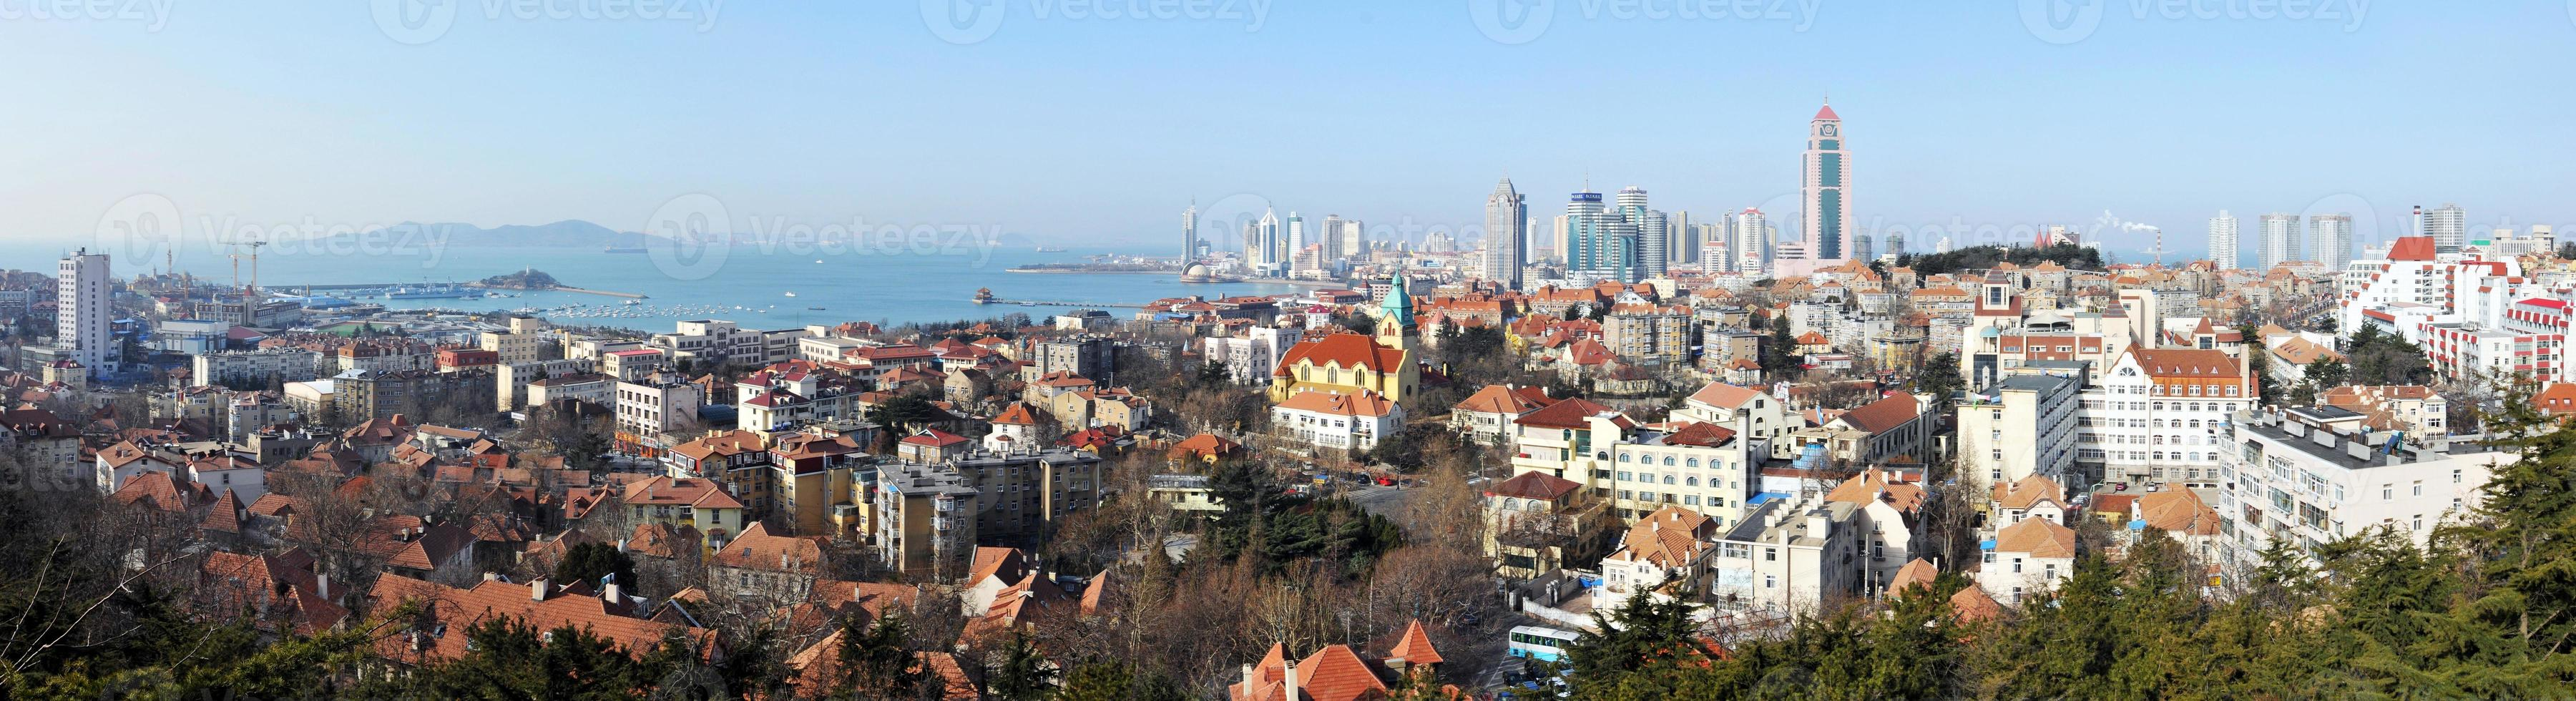 Qingdao City Panorama photo